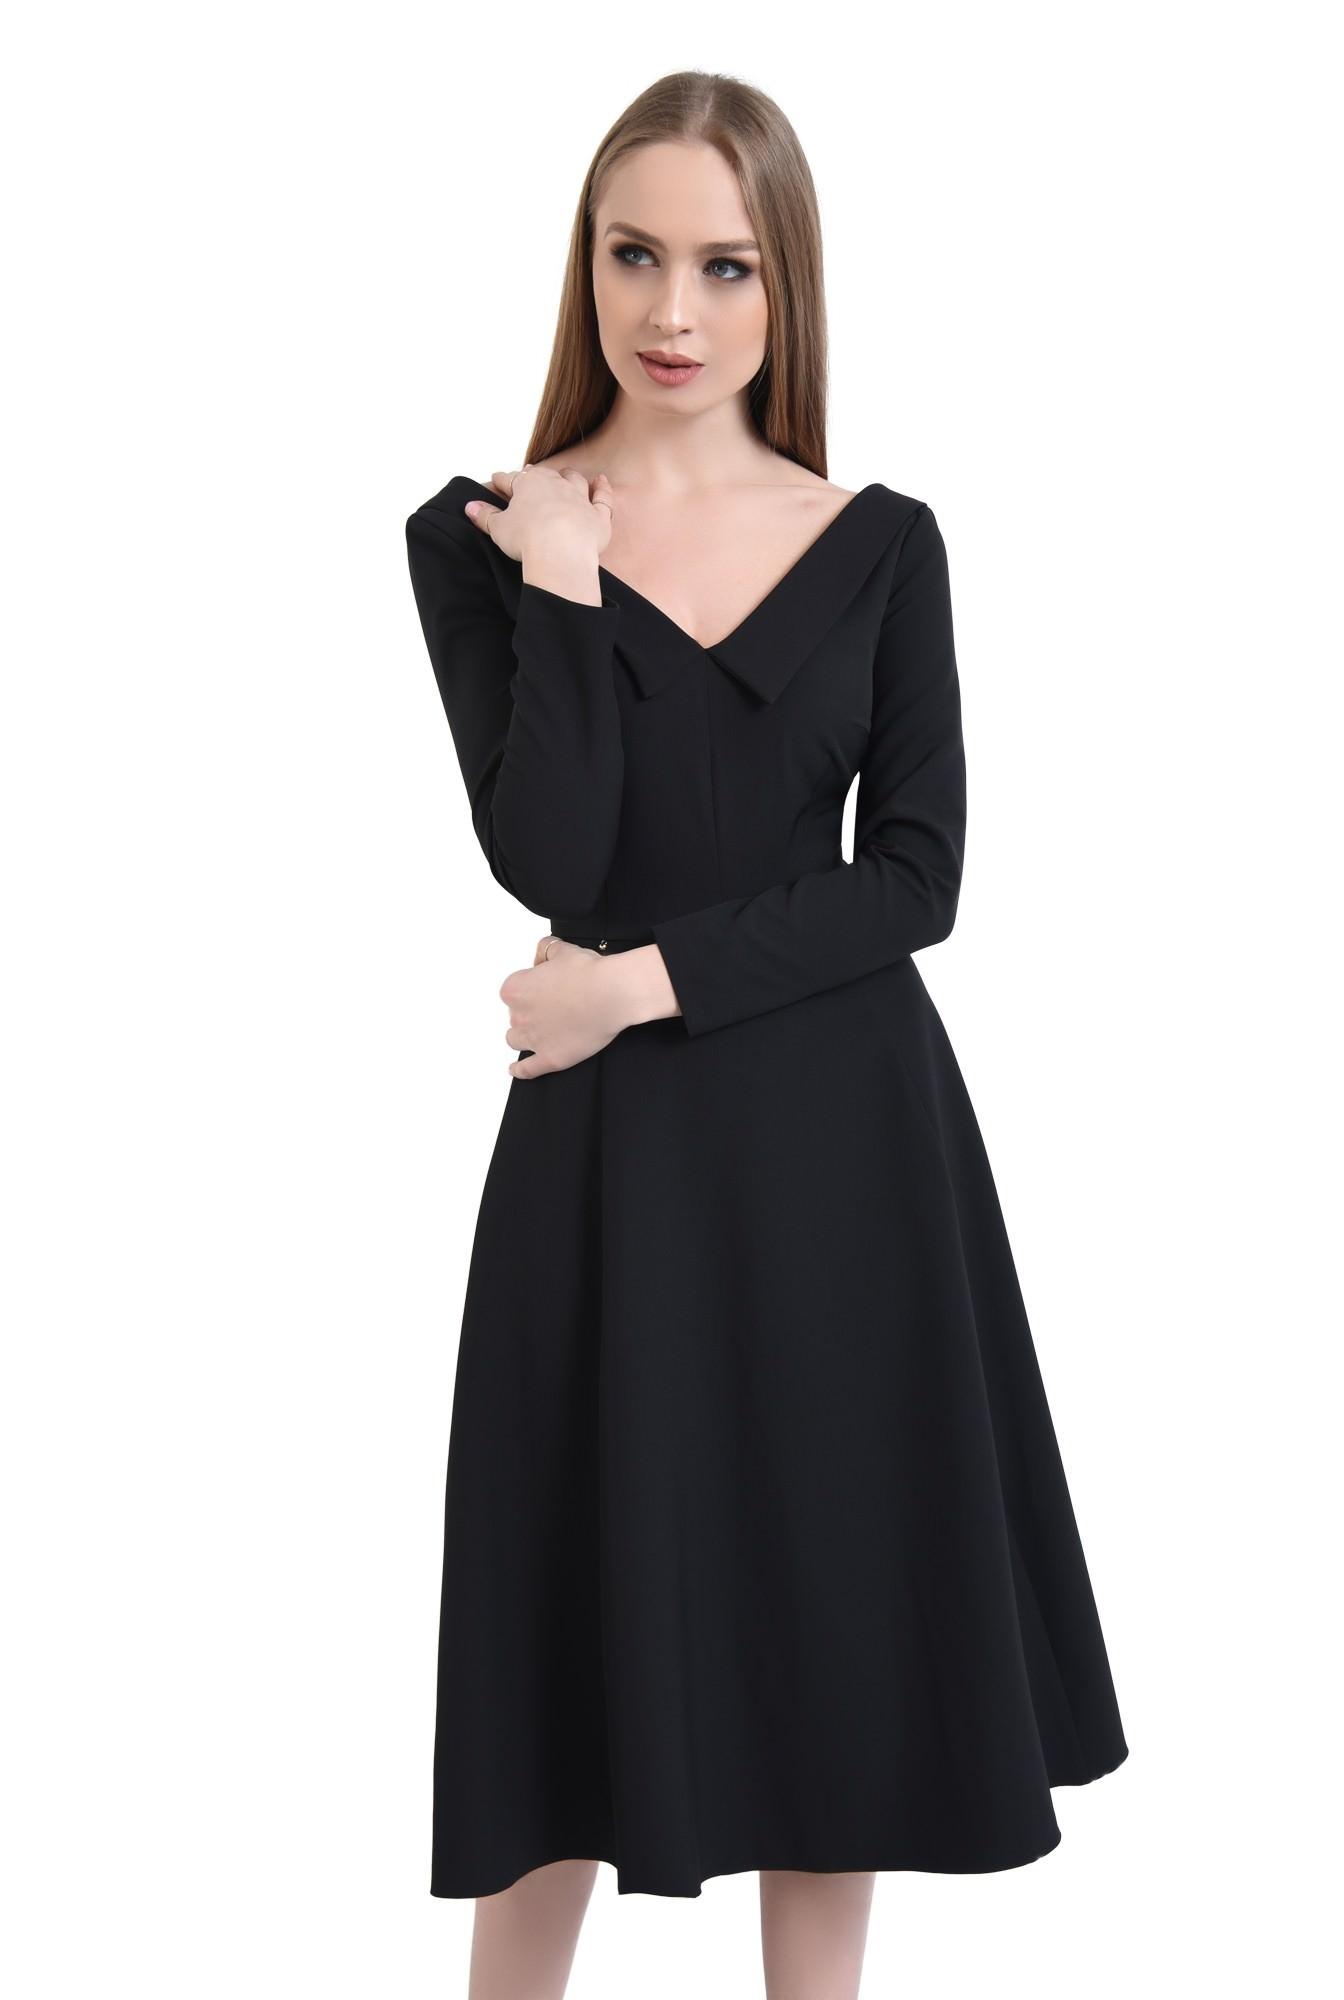 0 - Rochie eleganta, neagra